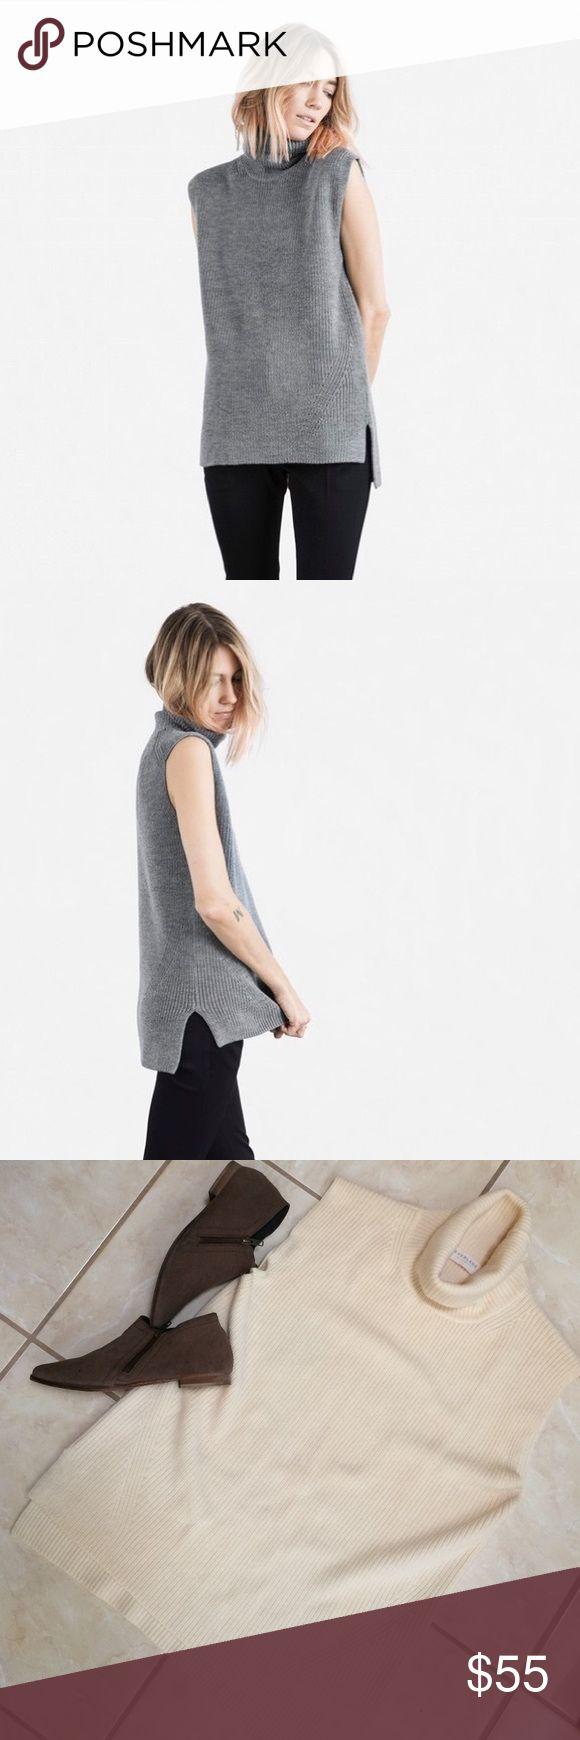 Everlane turtleneck sleeveless sweater Everlane sleeveless turtleneck sweater. Size Large. 100% wool. Everlane Sweaters Cowl & Turtlenecks